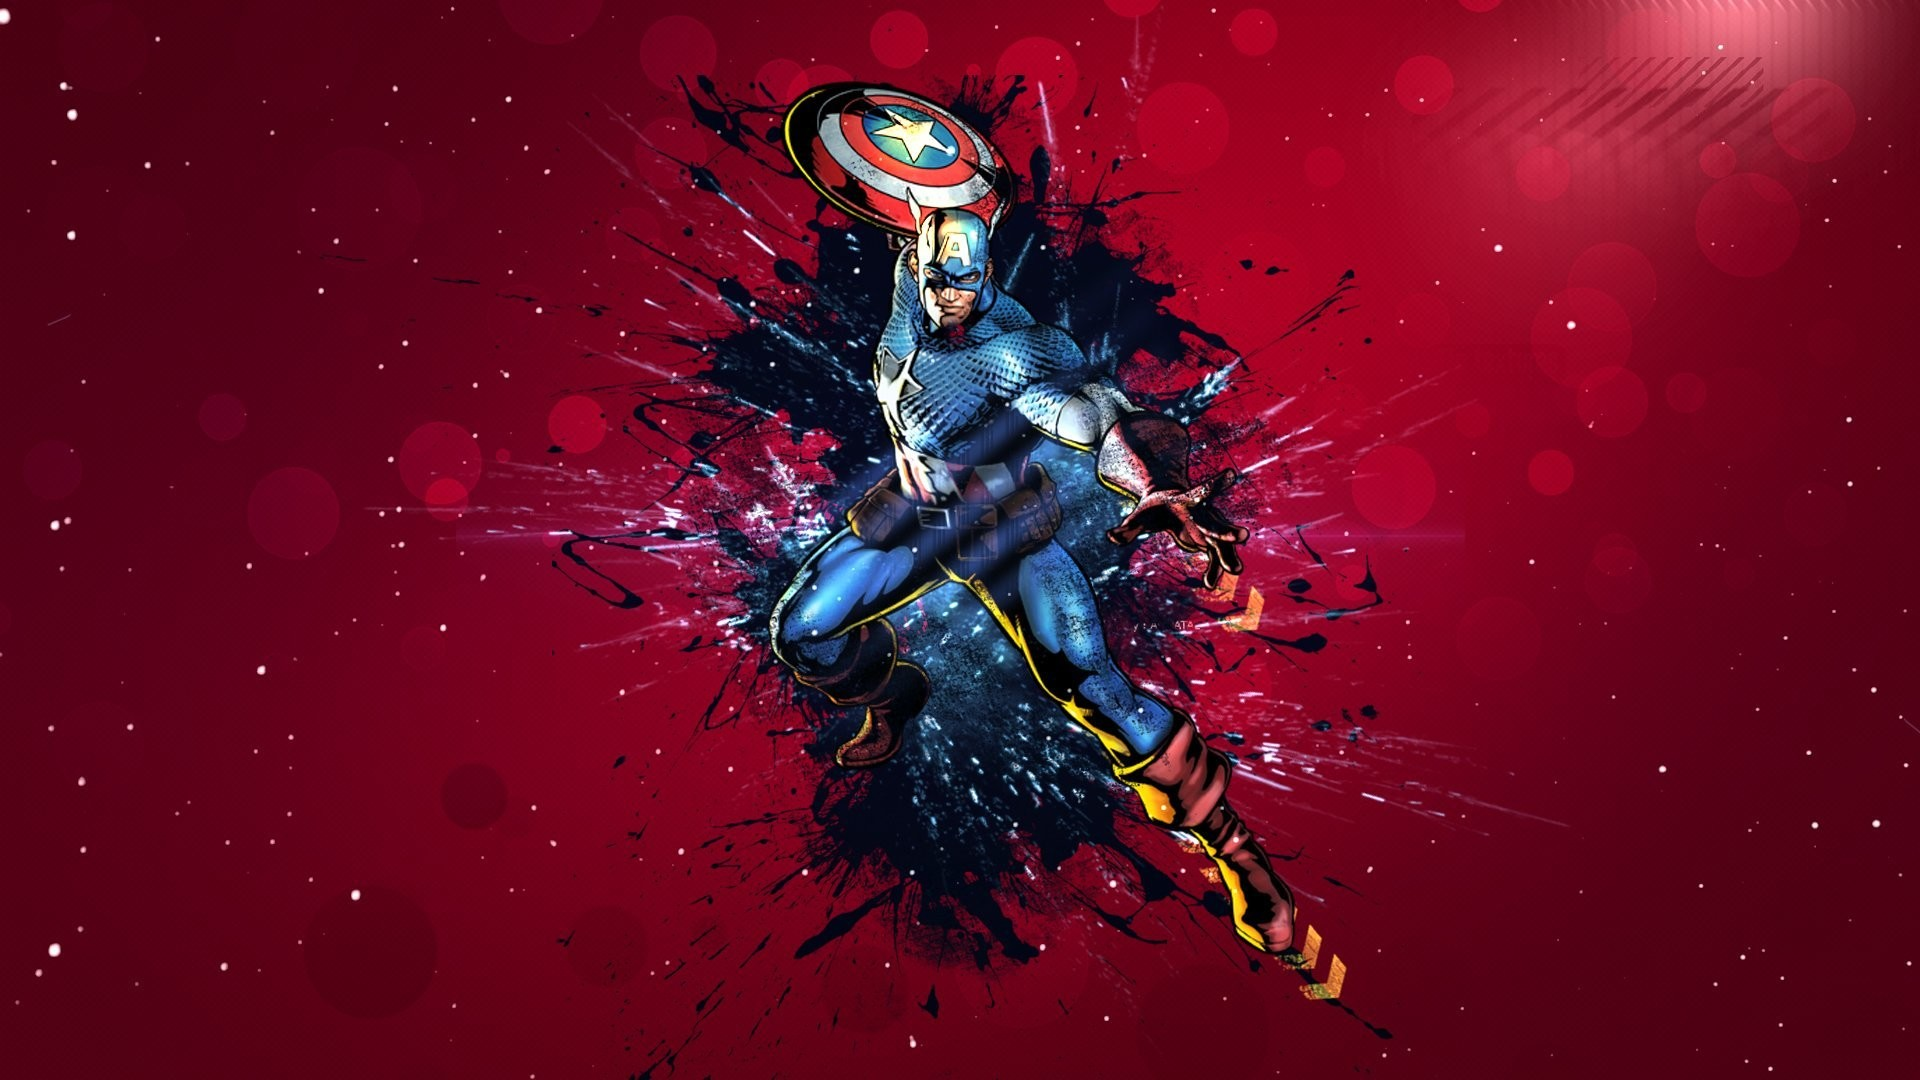 capitan america captain america shield mask form jump